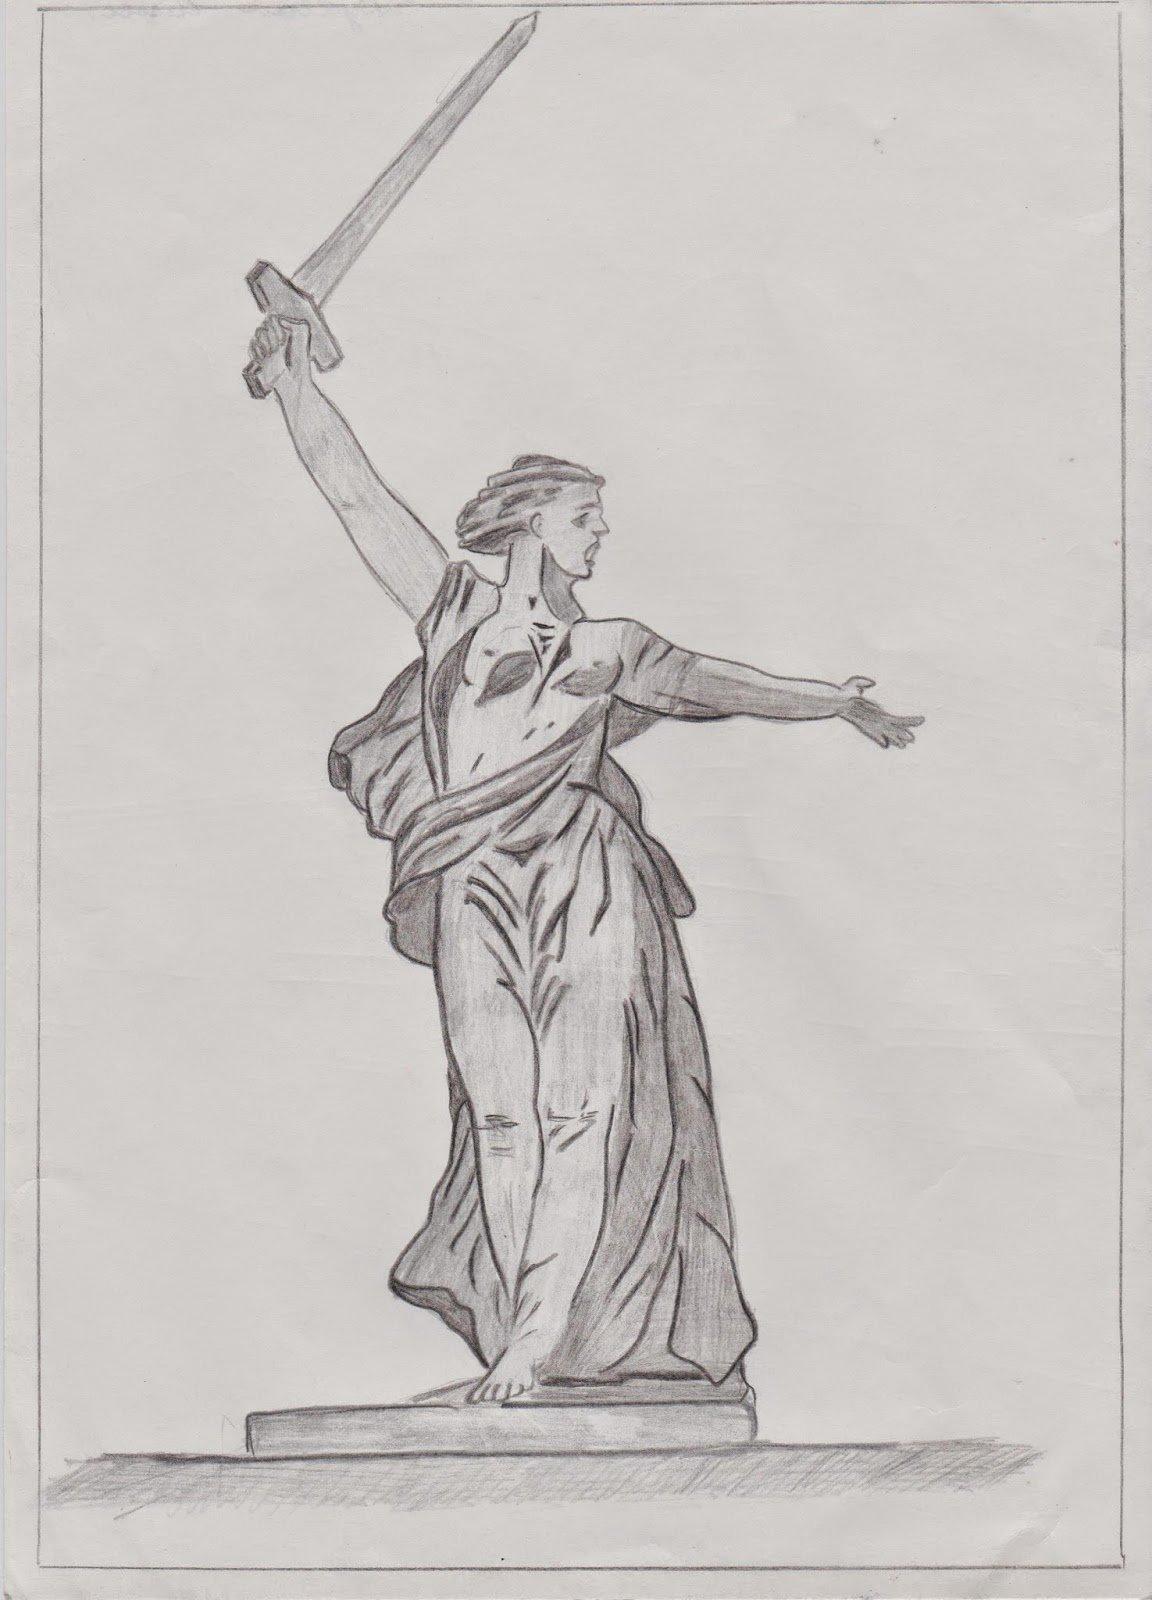 рисунок памятника карандашом плотности